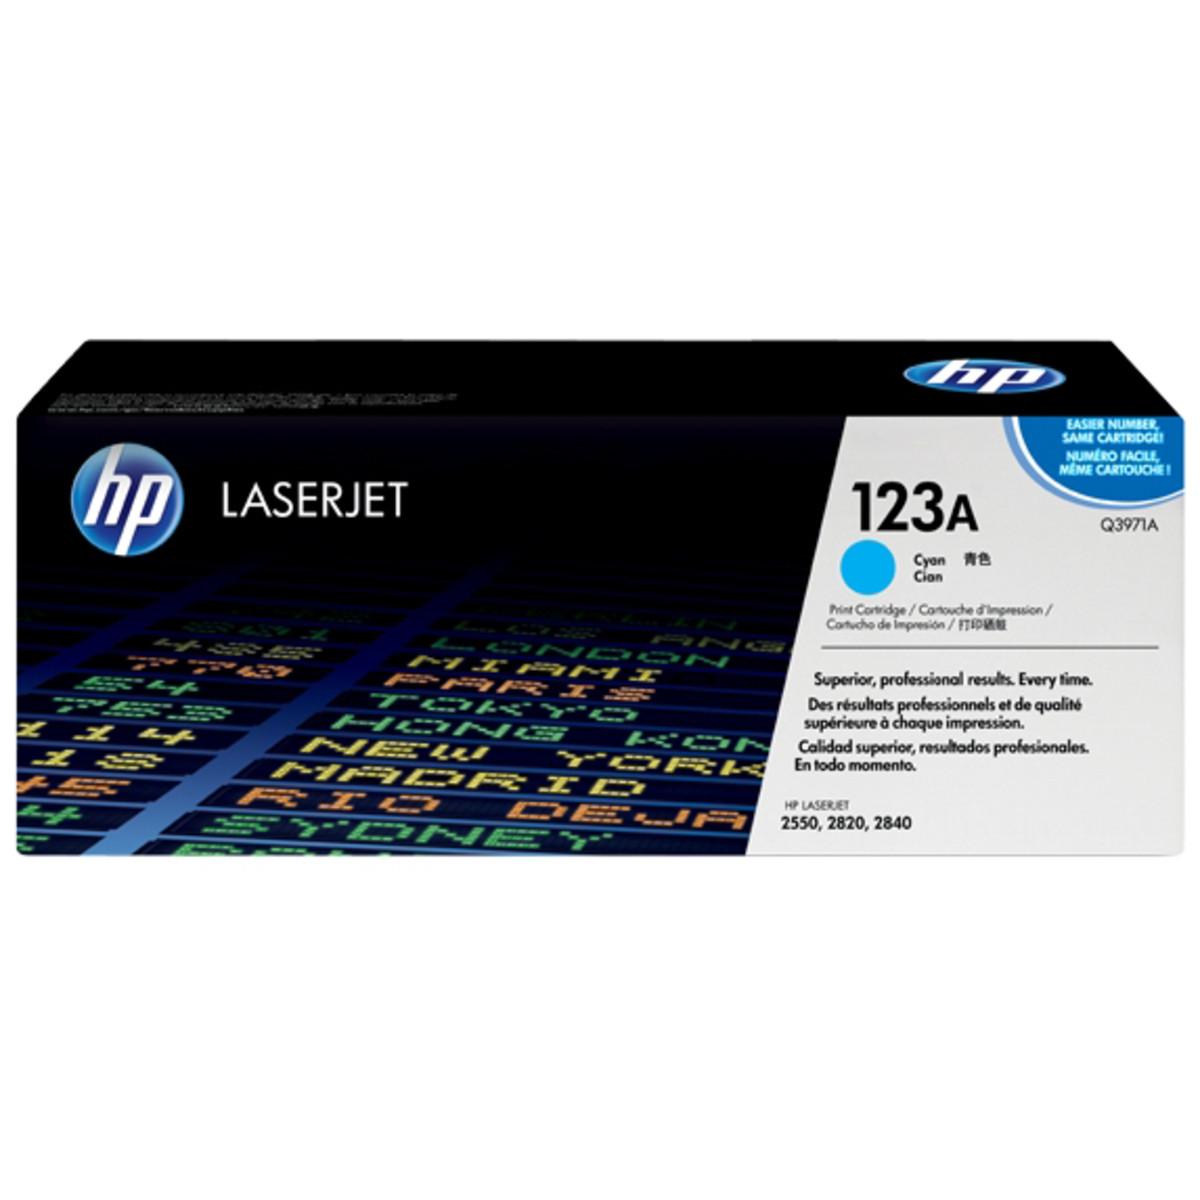 HP 123A (Q3971A) Cyan Toner Cartridge